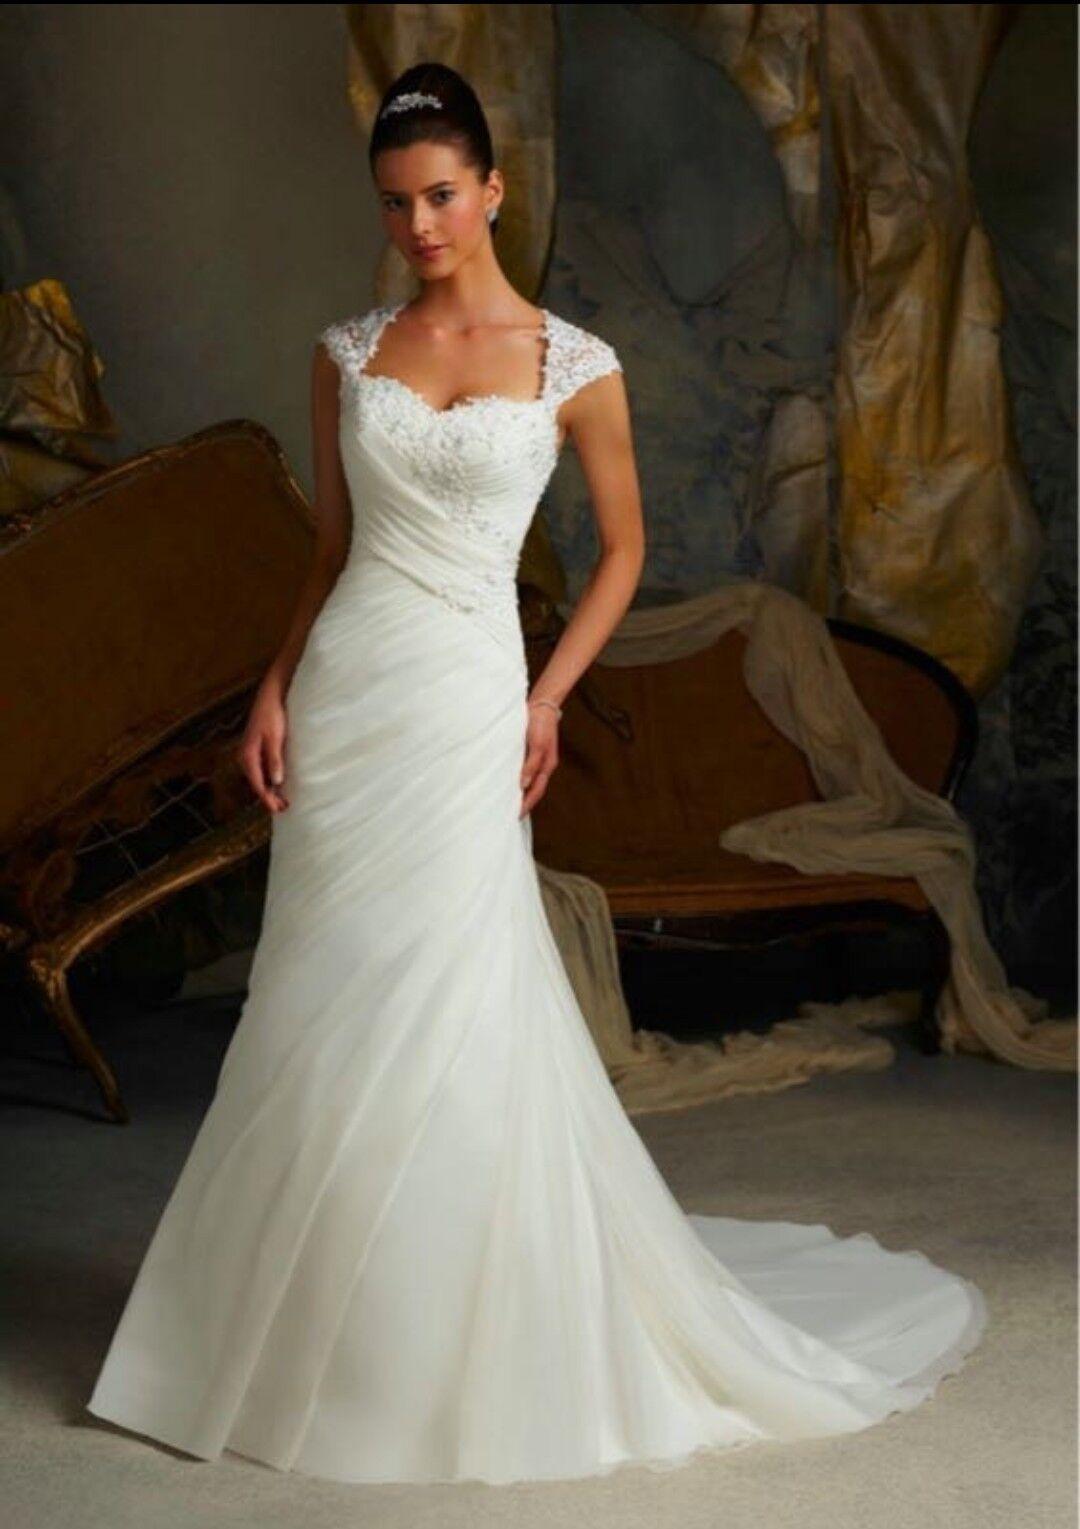 Luxury Organza Wedding Dresses White Size12 UK seller Custom Made to Measure